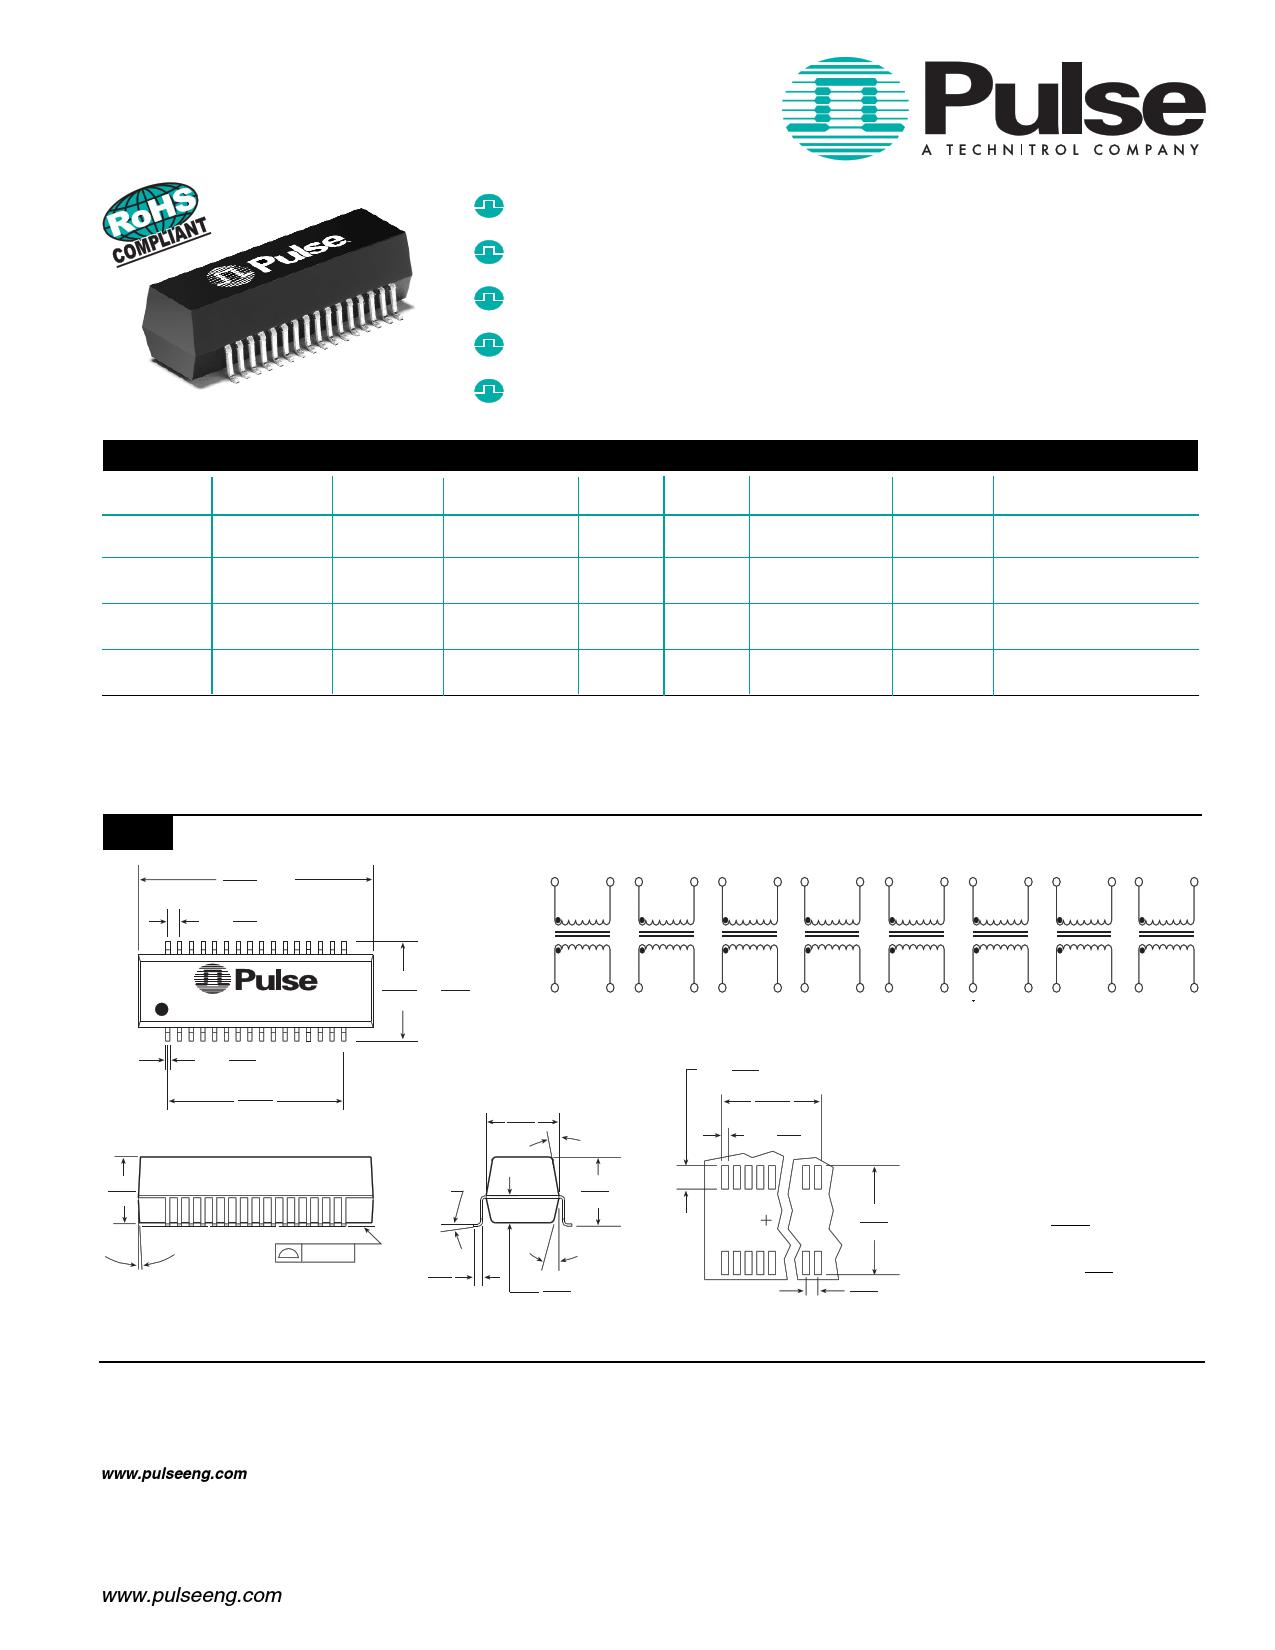 T3048 데이터시트 및 T3048 PDF